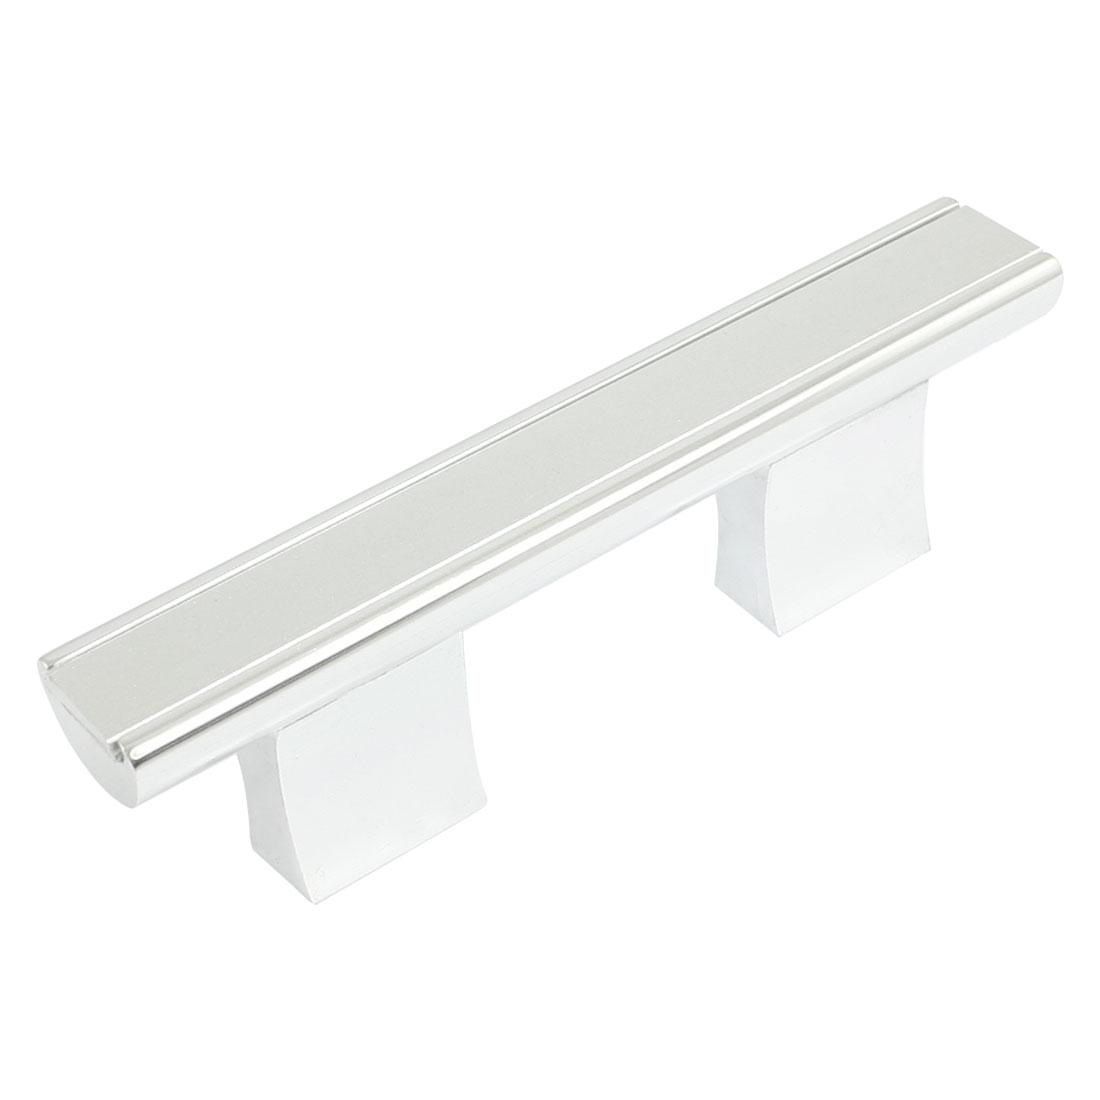 "Cupboard Hardware Concealed Screw Fix Aluminum Bar Grip Pull Handle 3.8"""